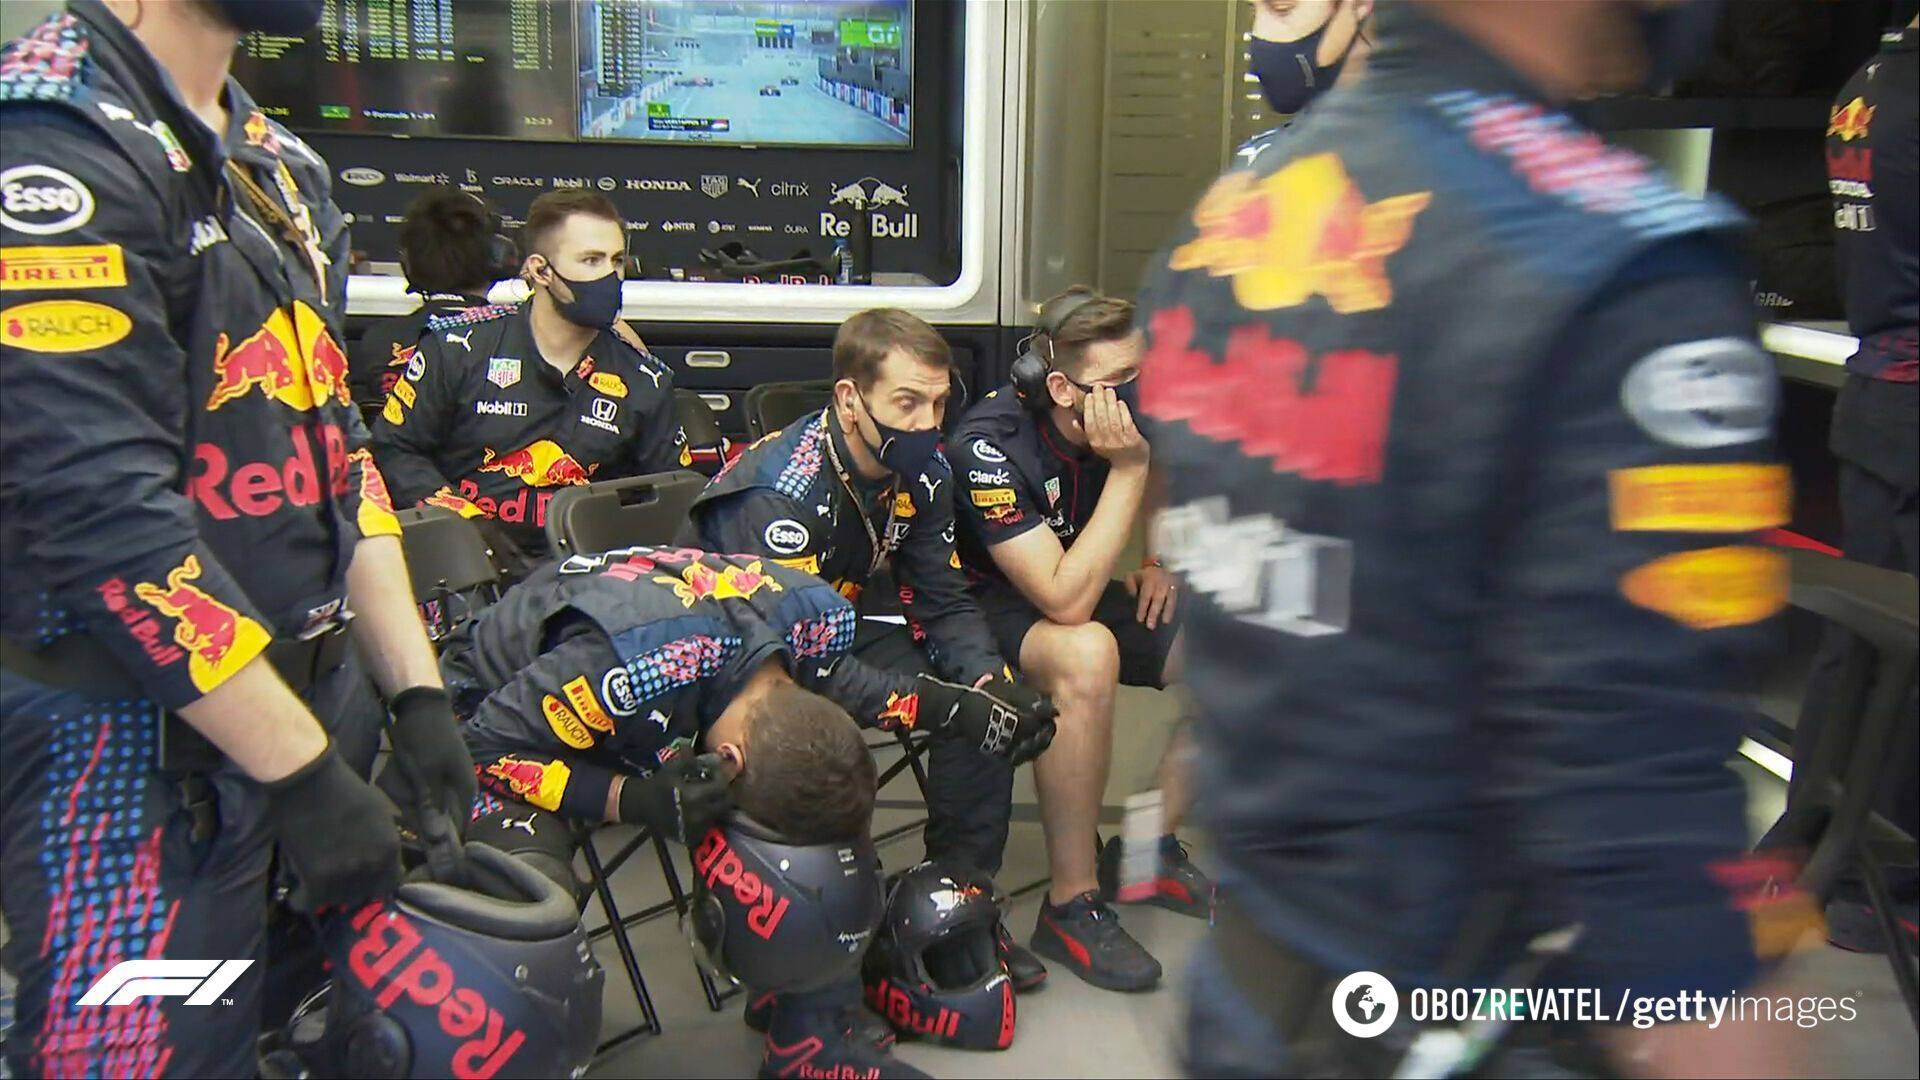 Разочарование команды Red Bull после аварии Ферстаппена